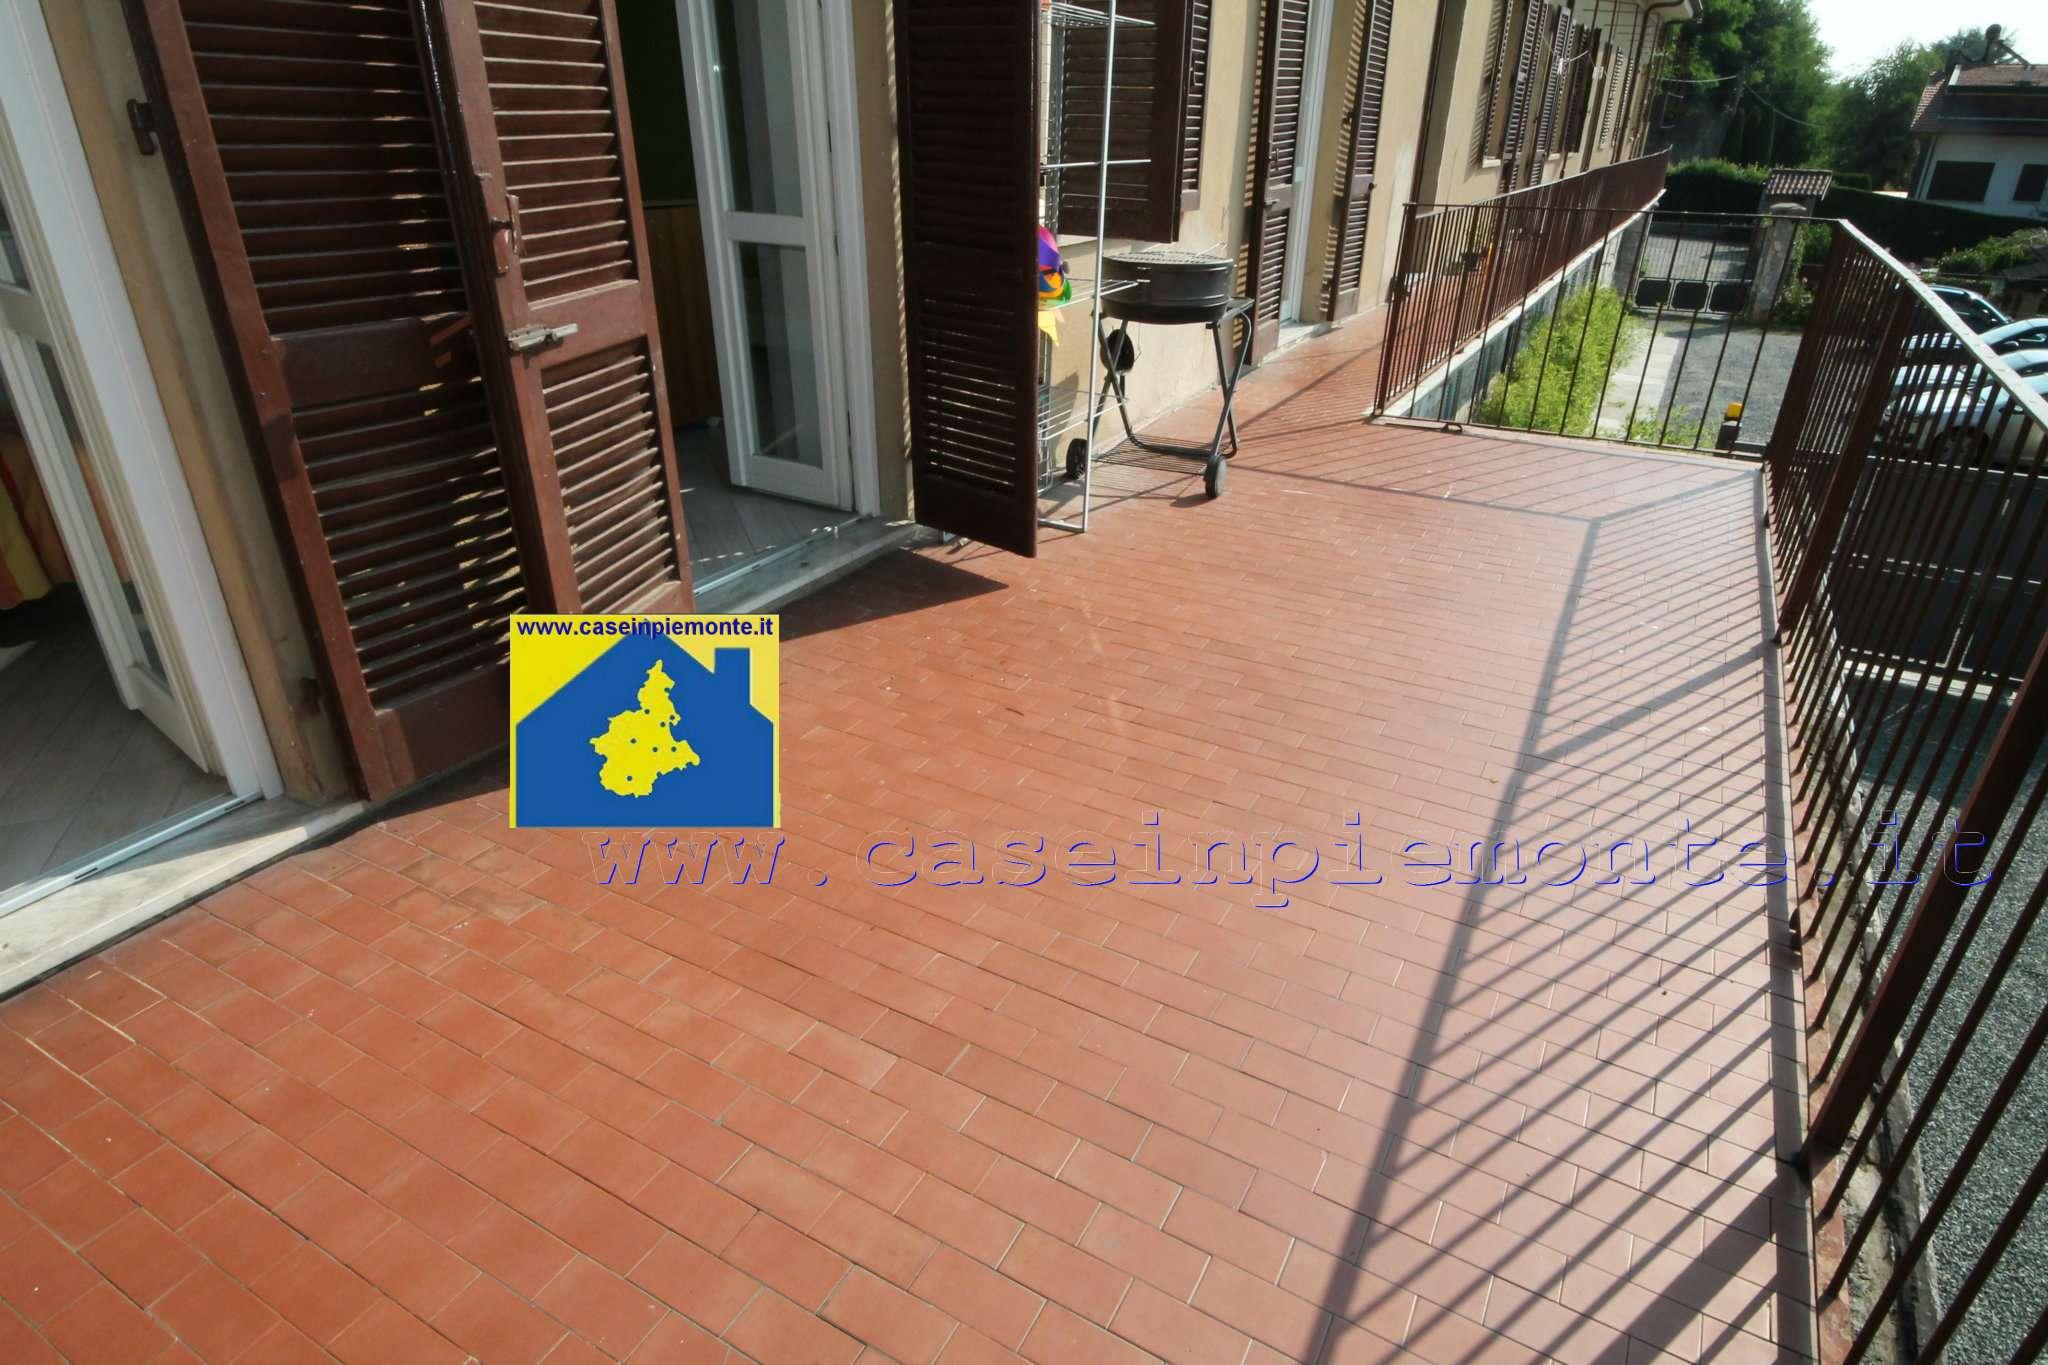 Foto 1 di Appartamento via Montelimar 61, Rivoli